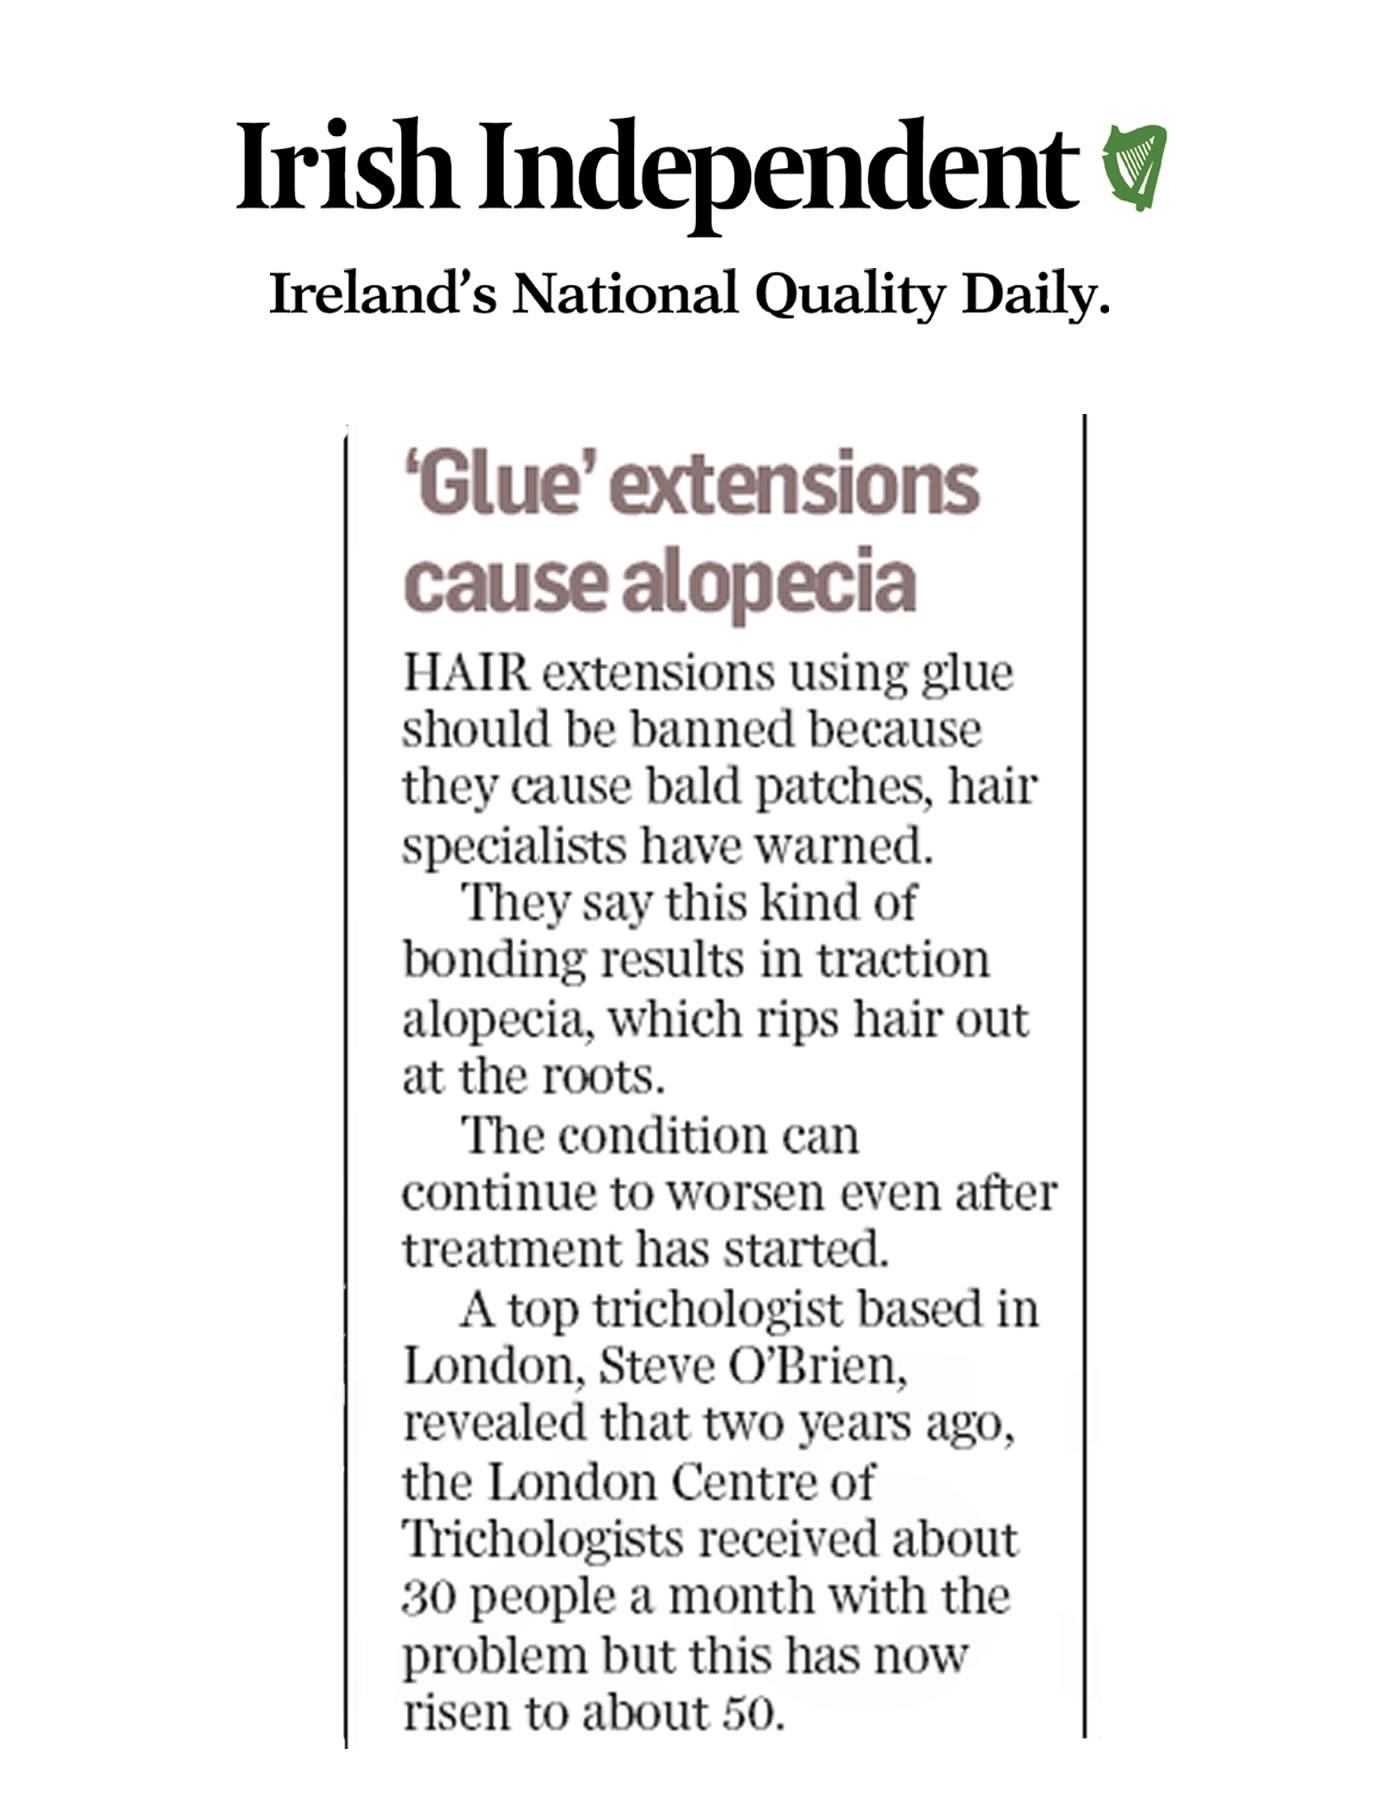 'Glue hair extensions cause alopecia' - BBC & Irish Independent